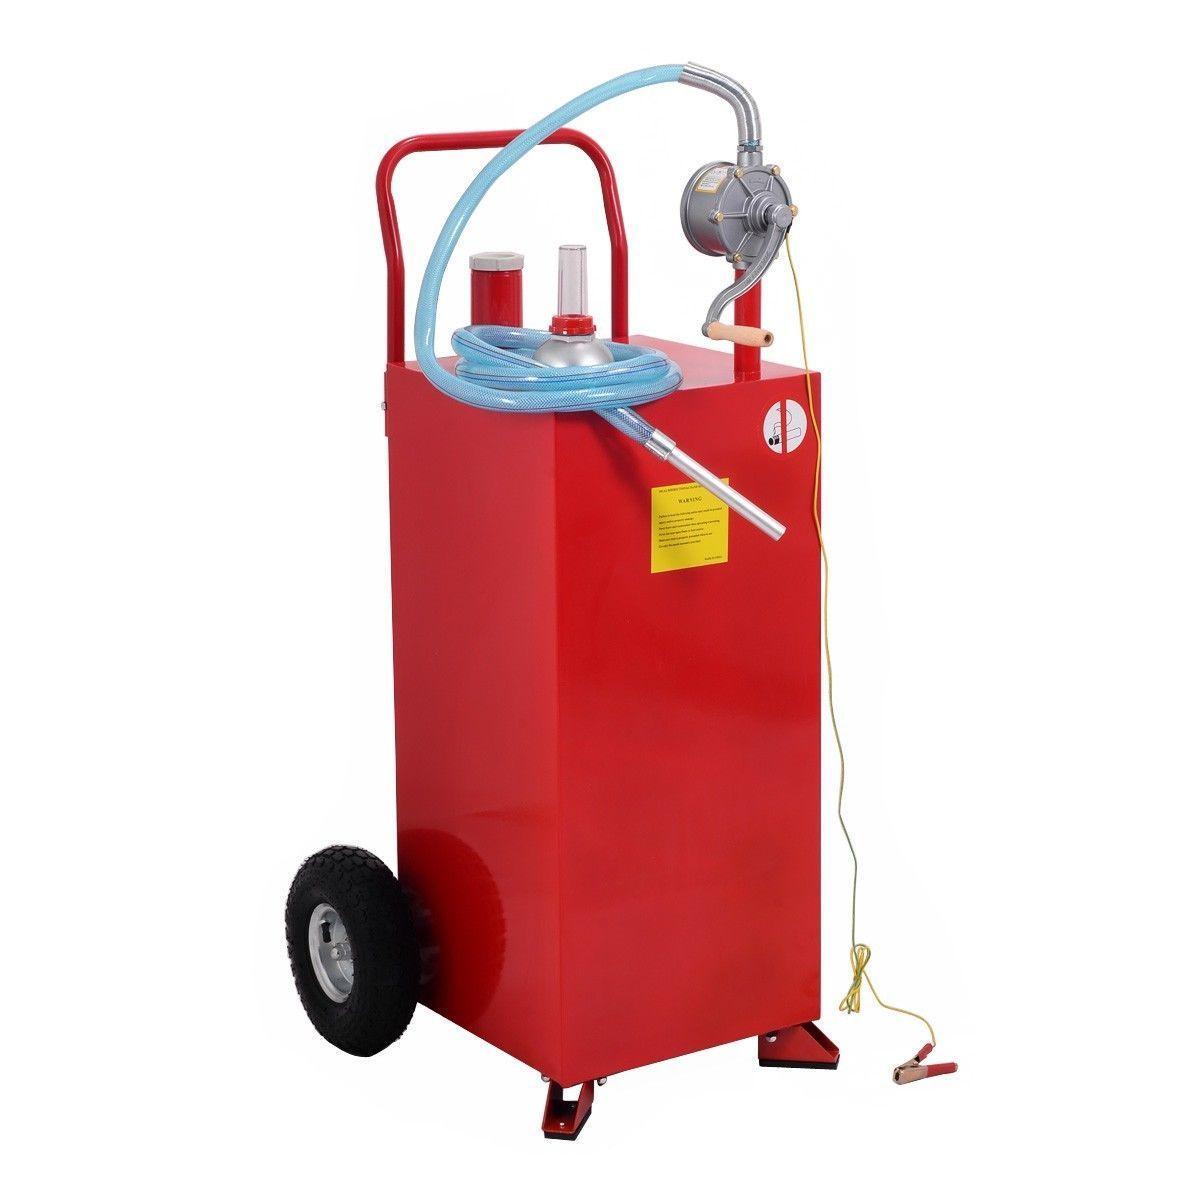 30 Gallon Gas Tank Storage Diesel Fuel Caddy Fuel Storage Diesel Fuel Gas Tanks